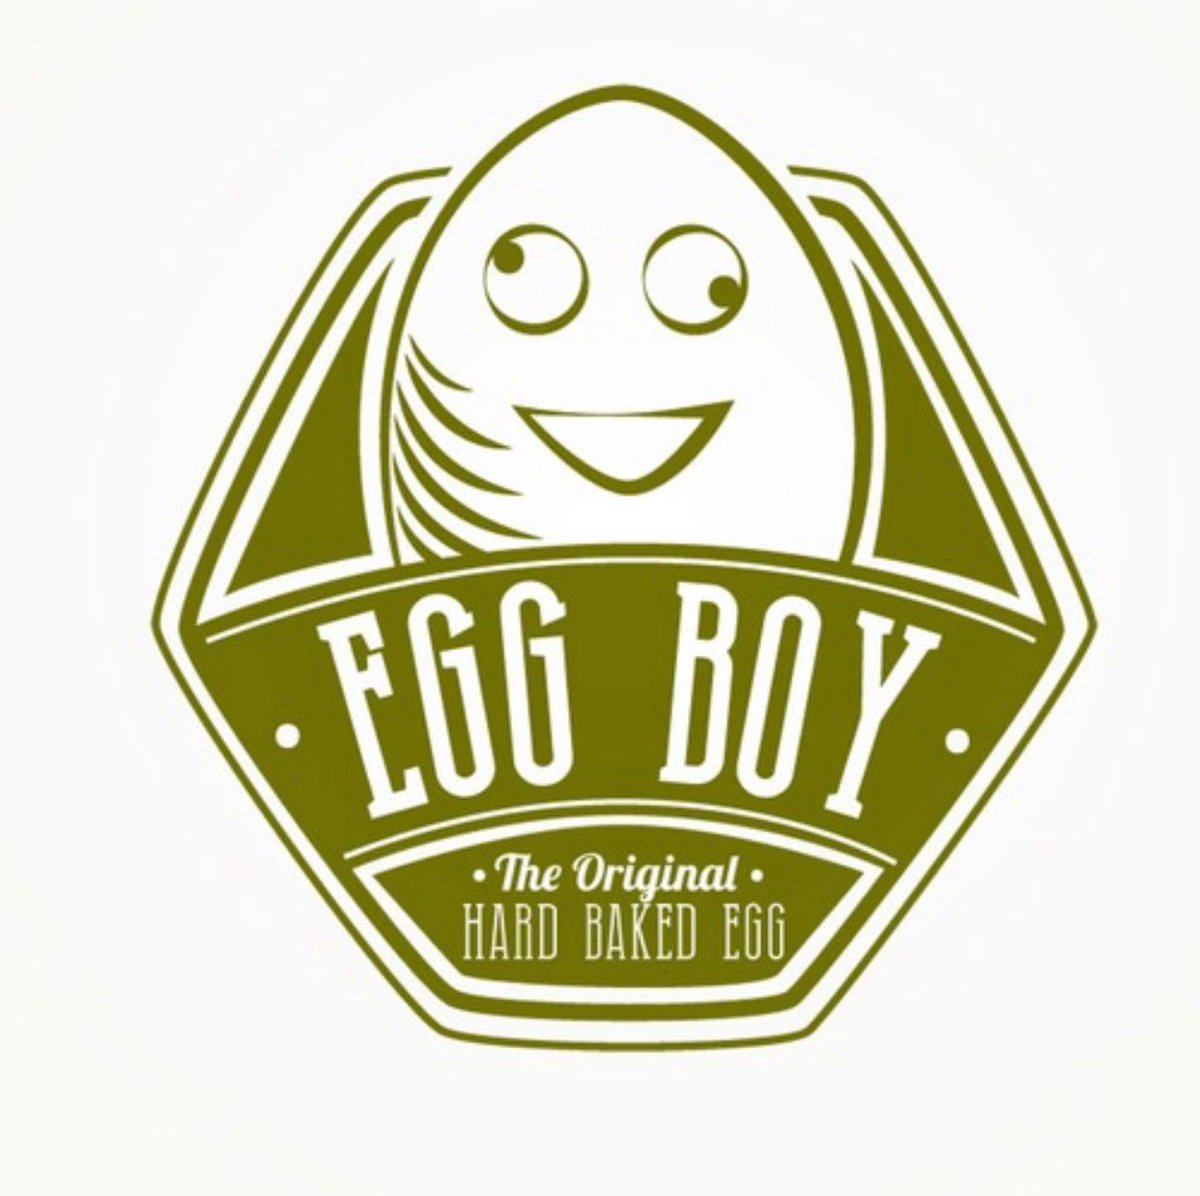 Egg Boi meme (via Rhys Muldoon)